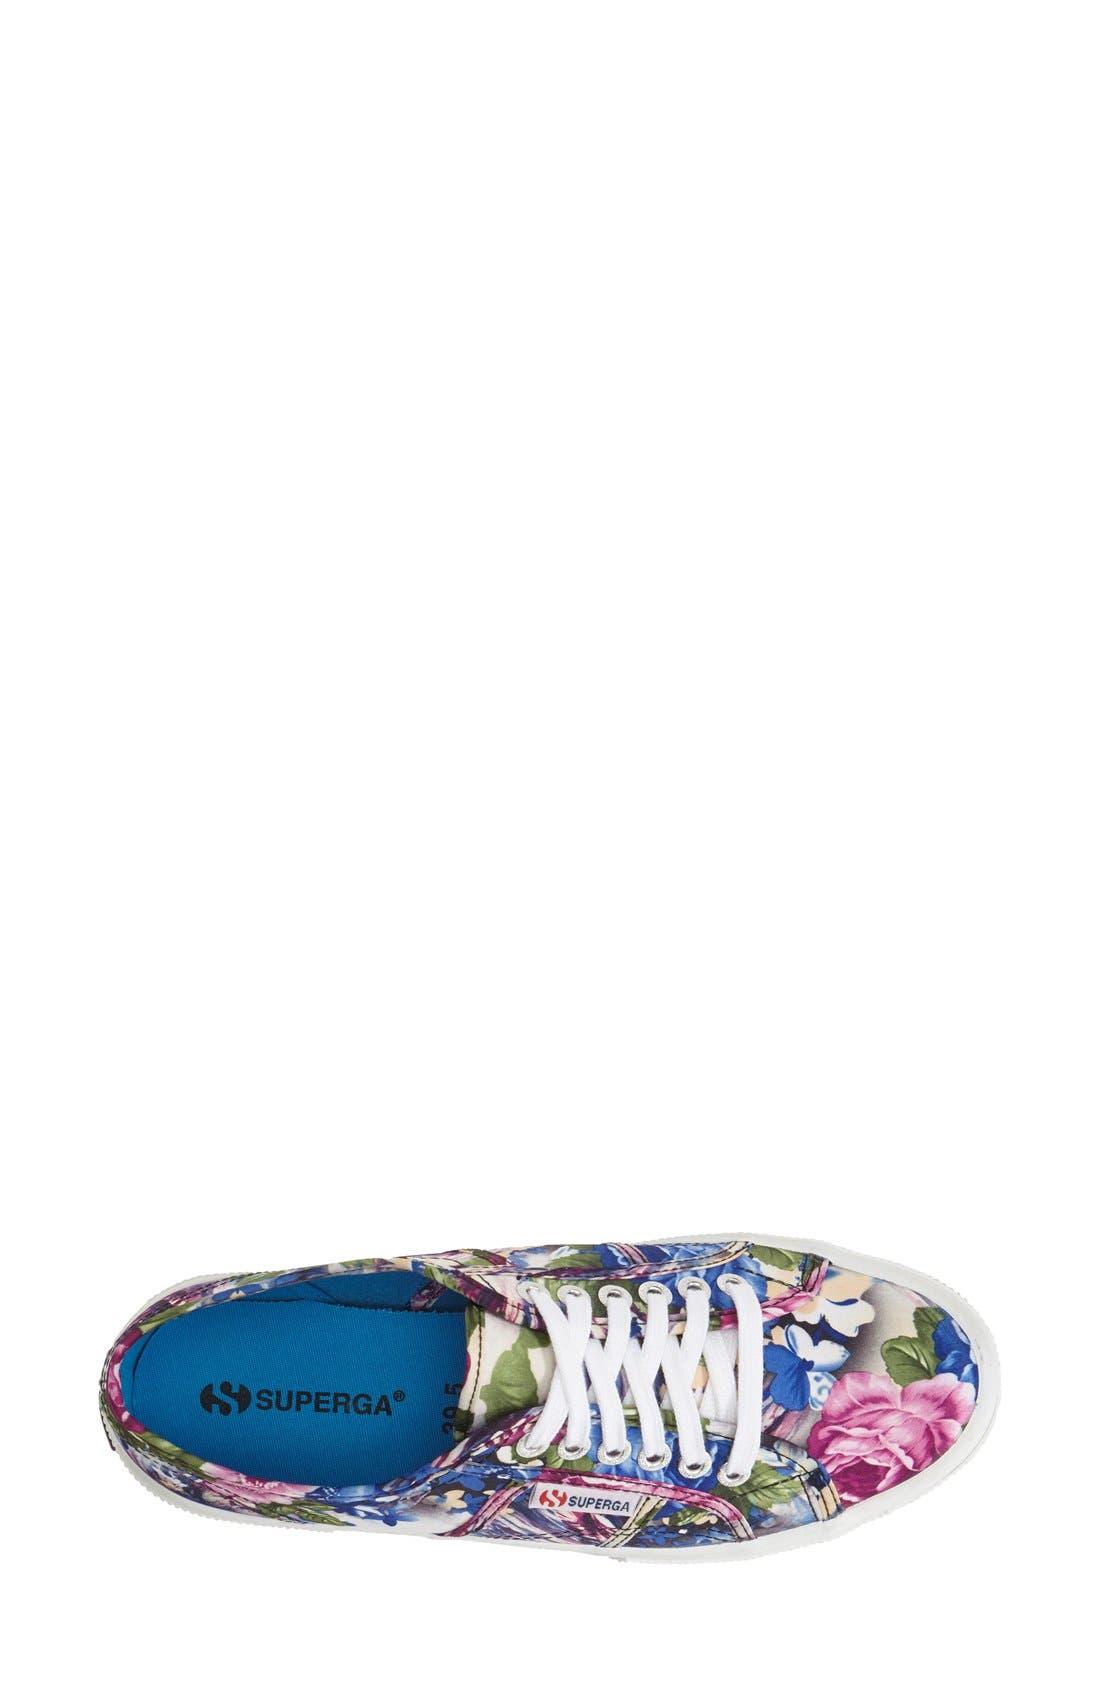 Alternate Image 3  - Superga 'Cotu' Floral Print Sneaker (Women)